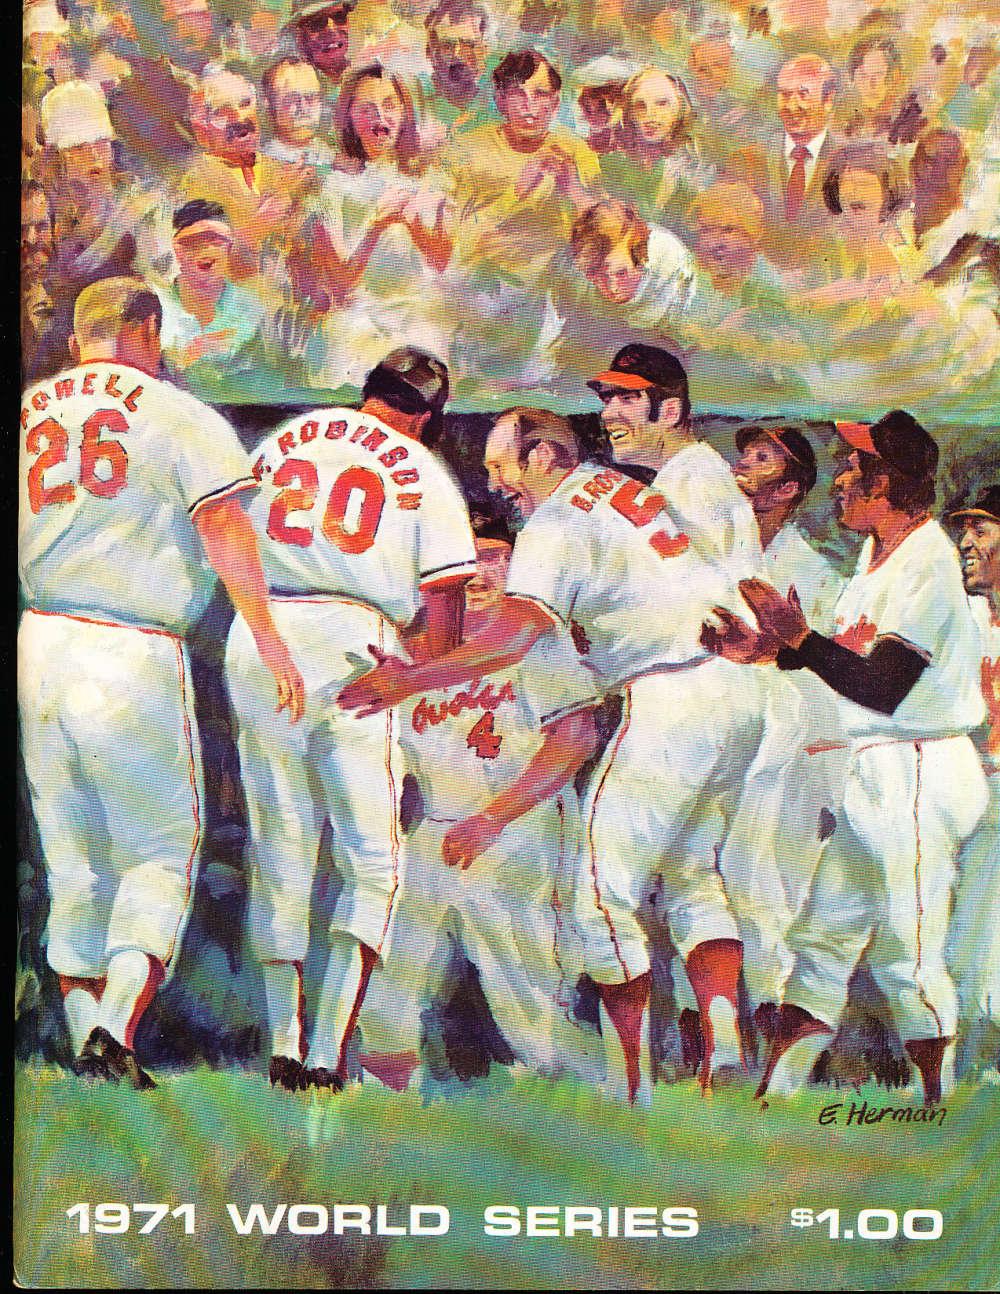 1971 World Series Program Baltimore Orioles vs pittsburgh pirates nm bx3